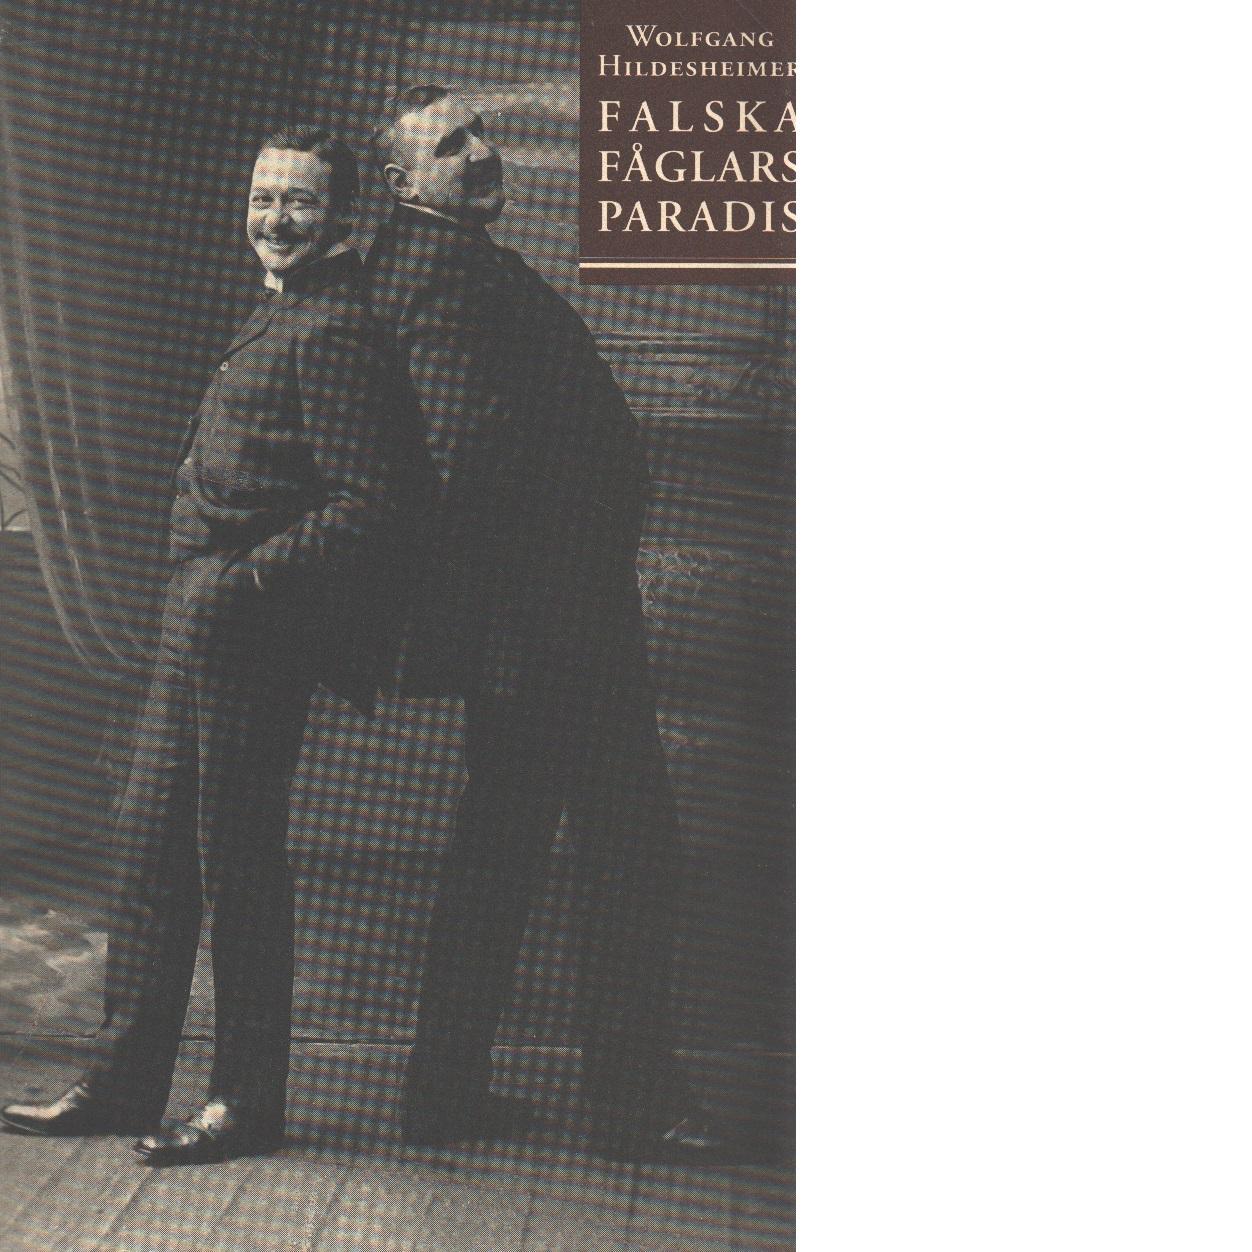 Falska fåglars paradis - Hildesheimer, Wolfgang